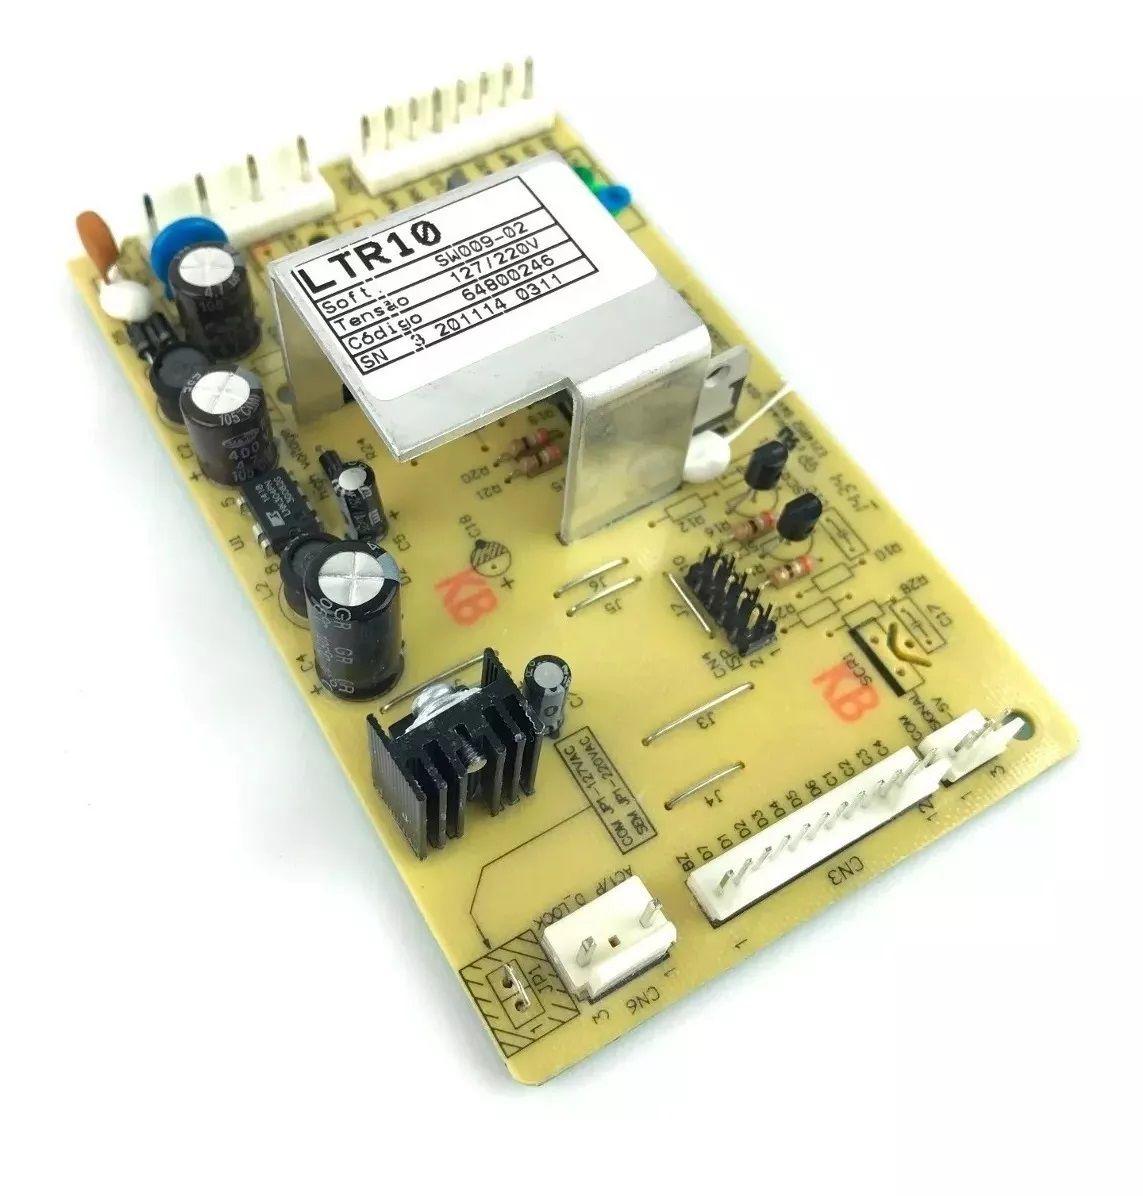 Placa Eletrônica Lavadora Electrolux Ltr10 64800246